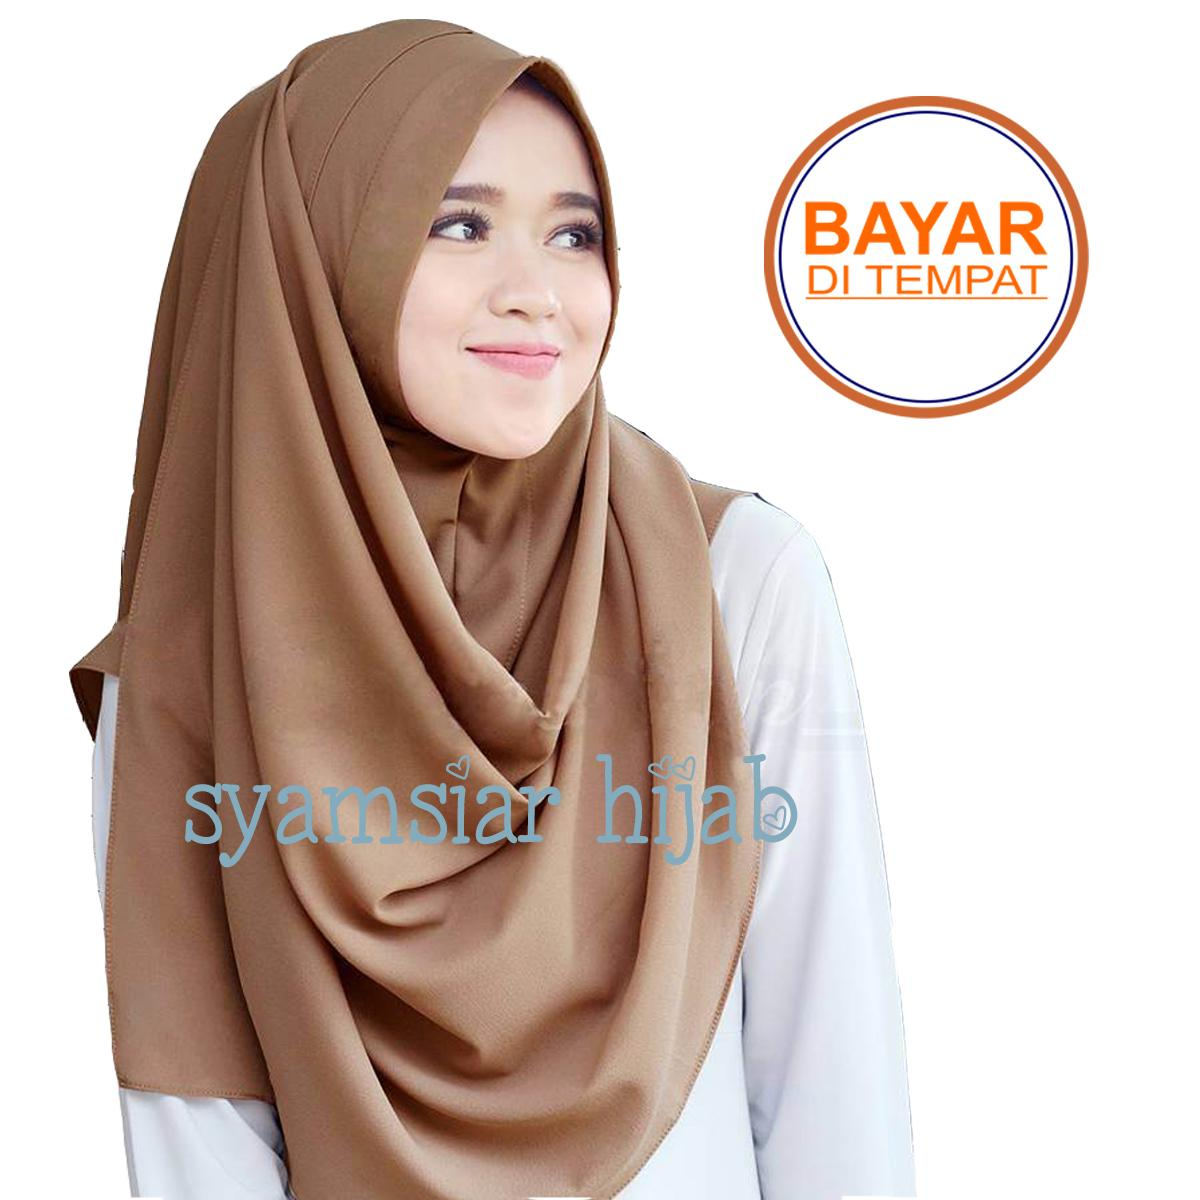 PROMO  Jilbab   Hijab Pashmina Instan ZAFINA - Kerudung Pasmina Instant a48cb5a4b3